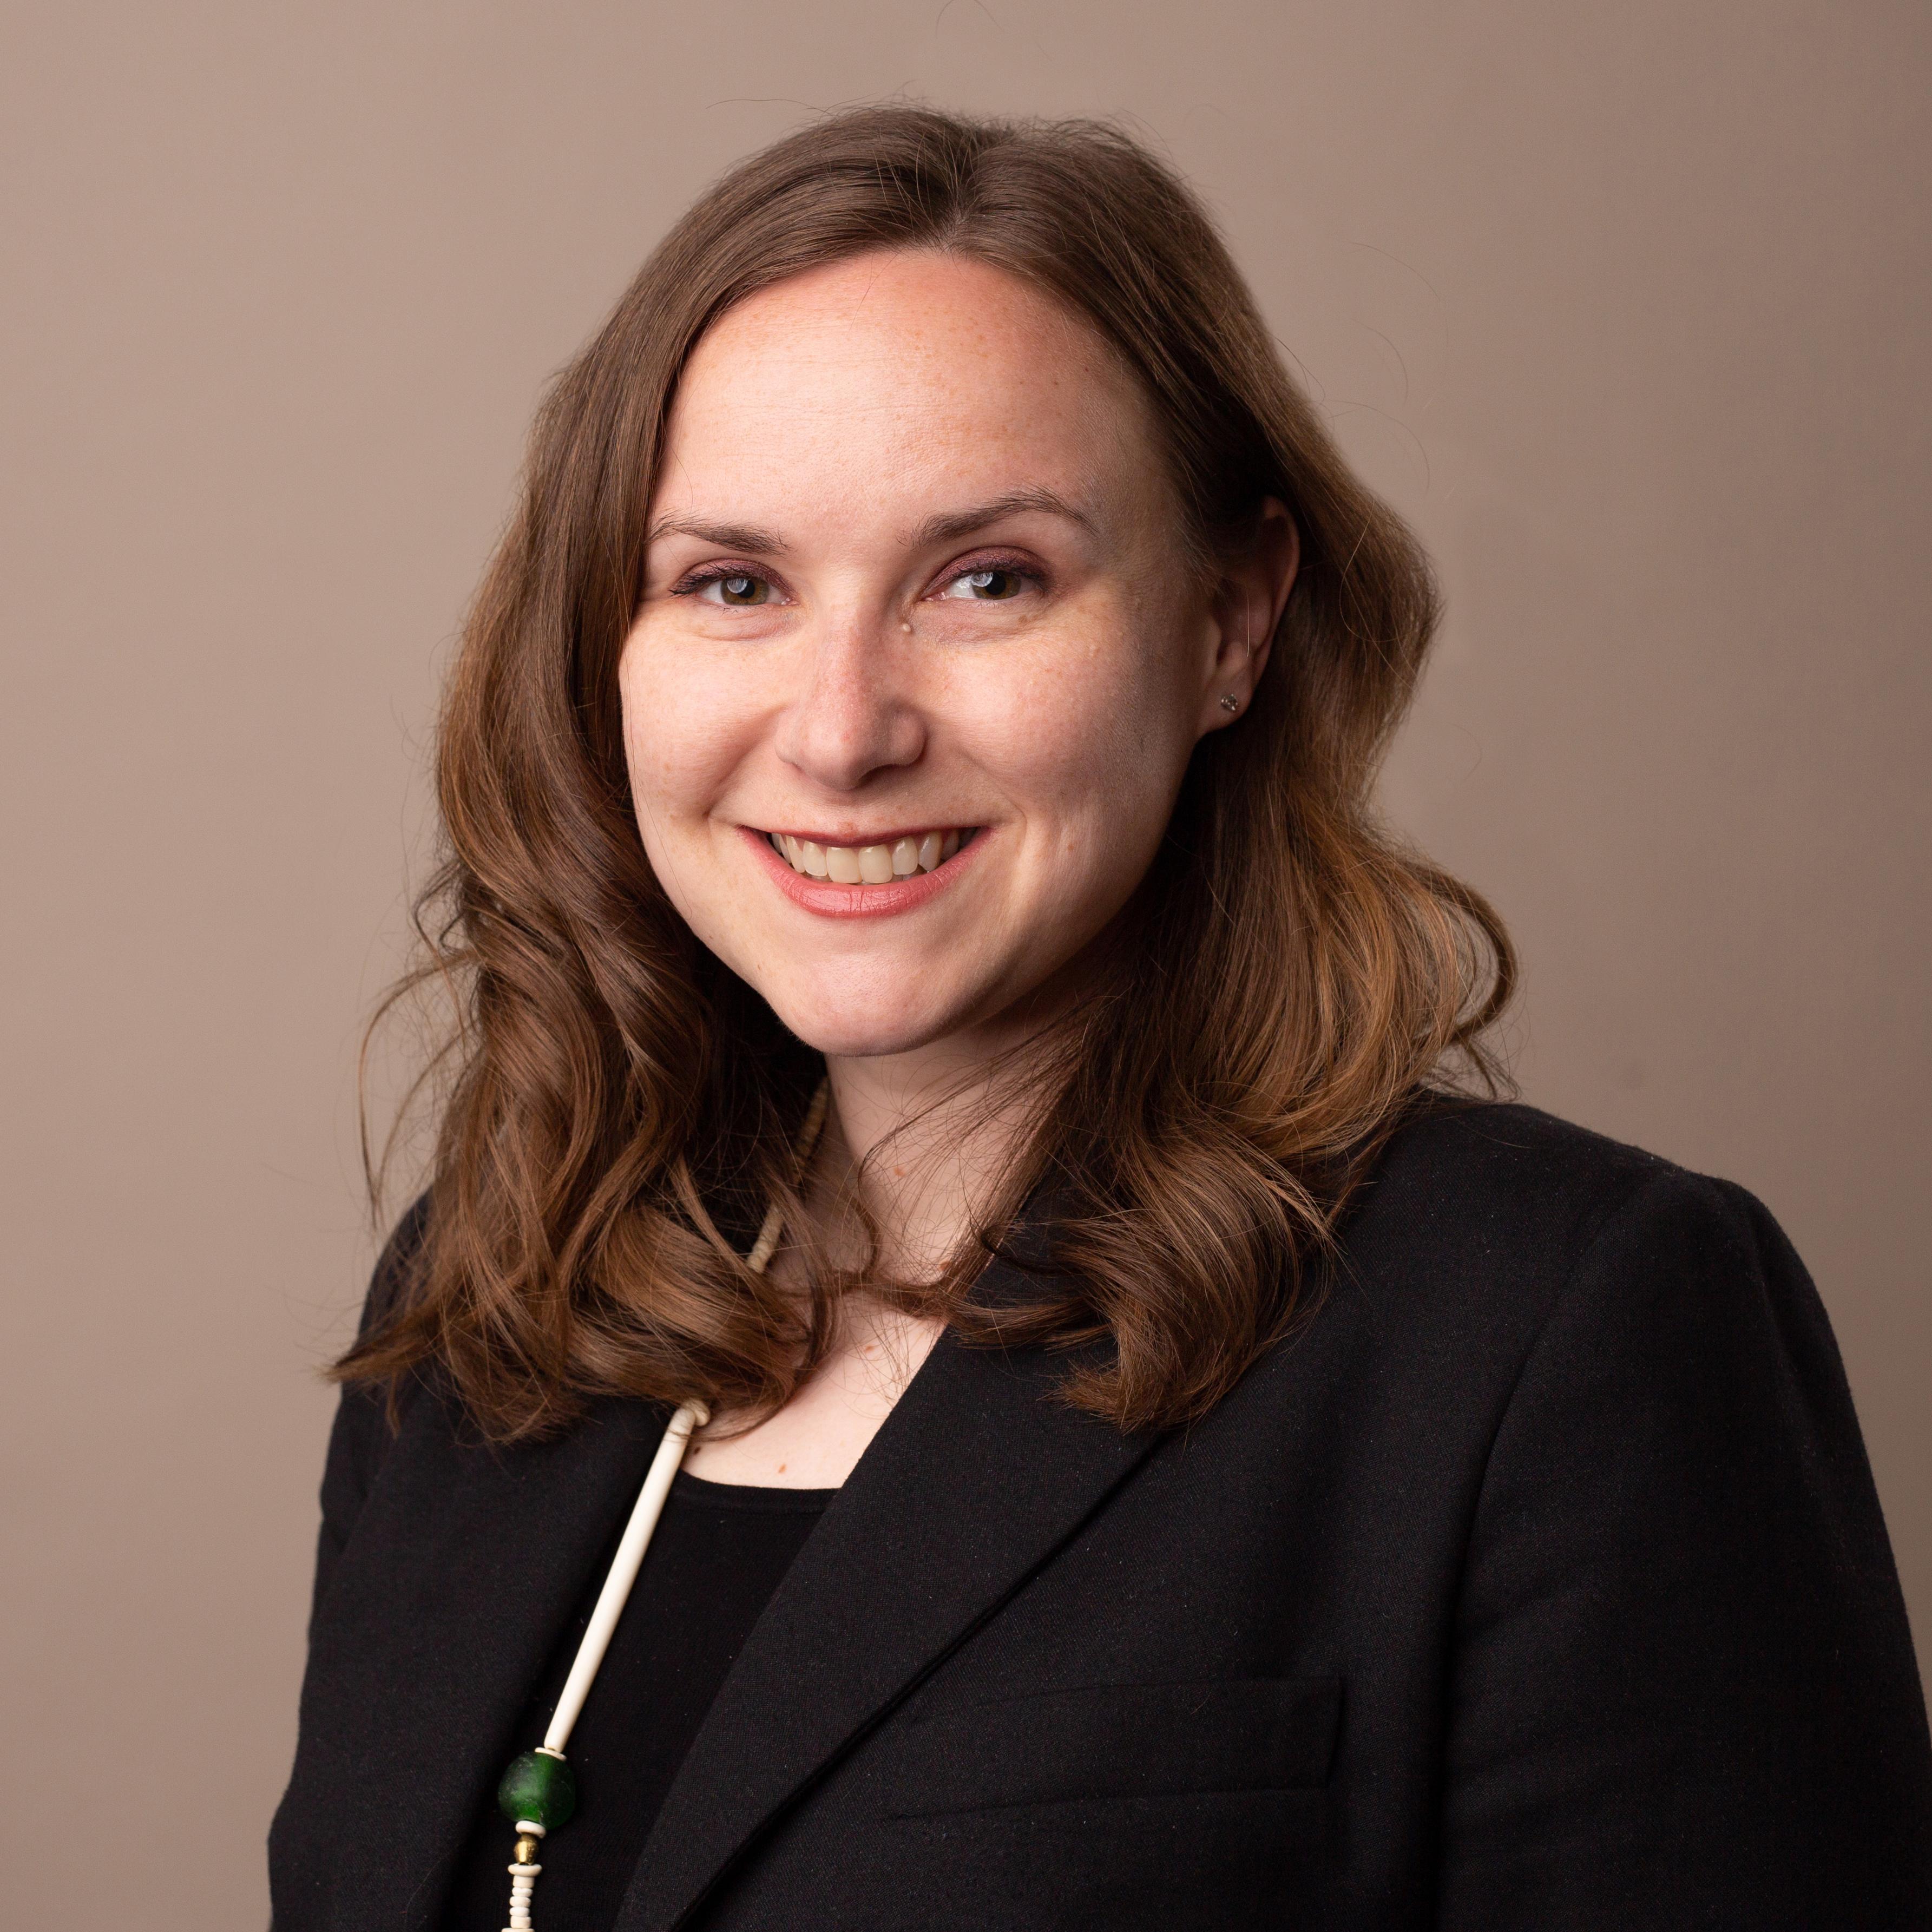 Sarah Kassen